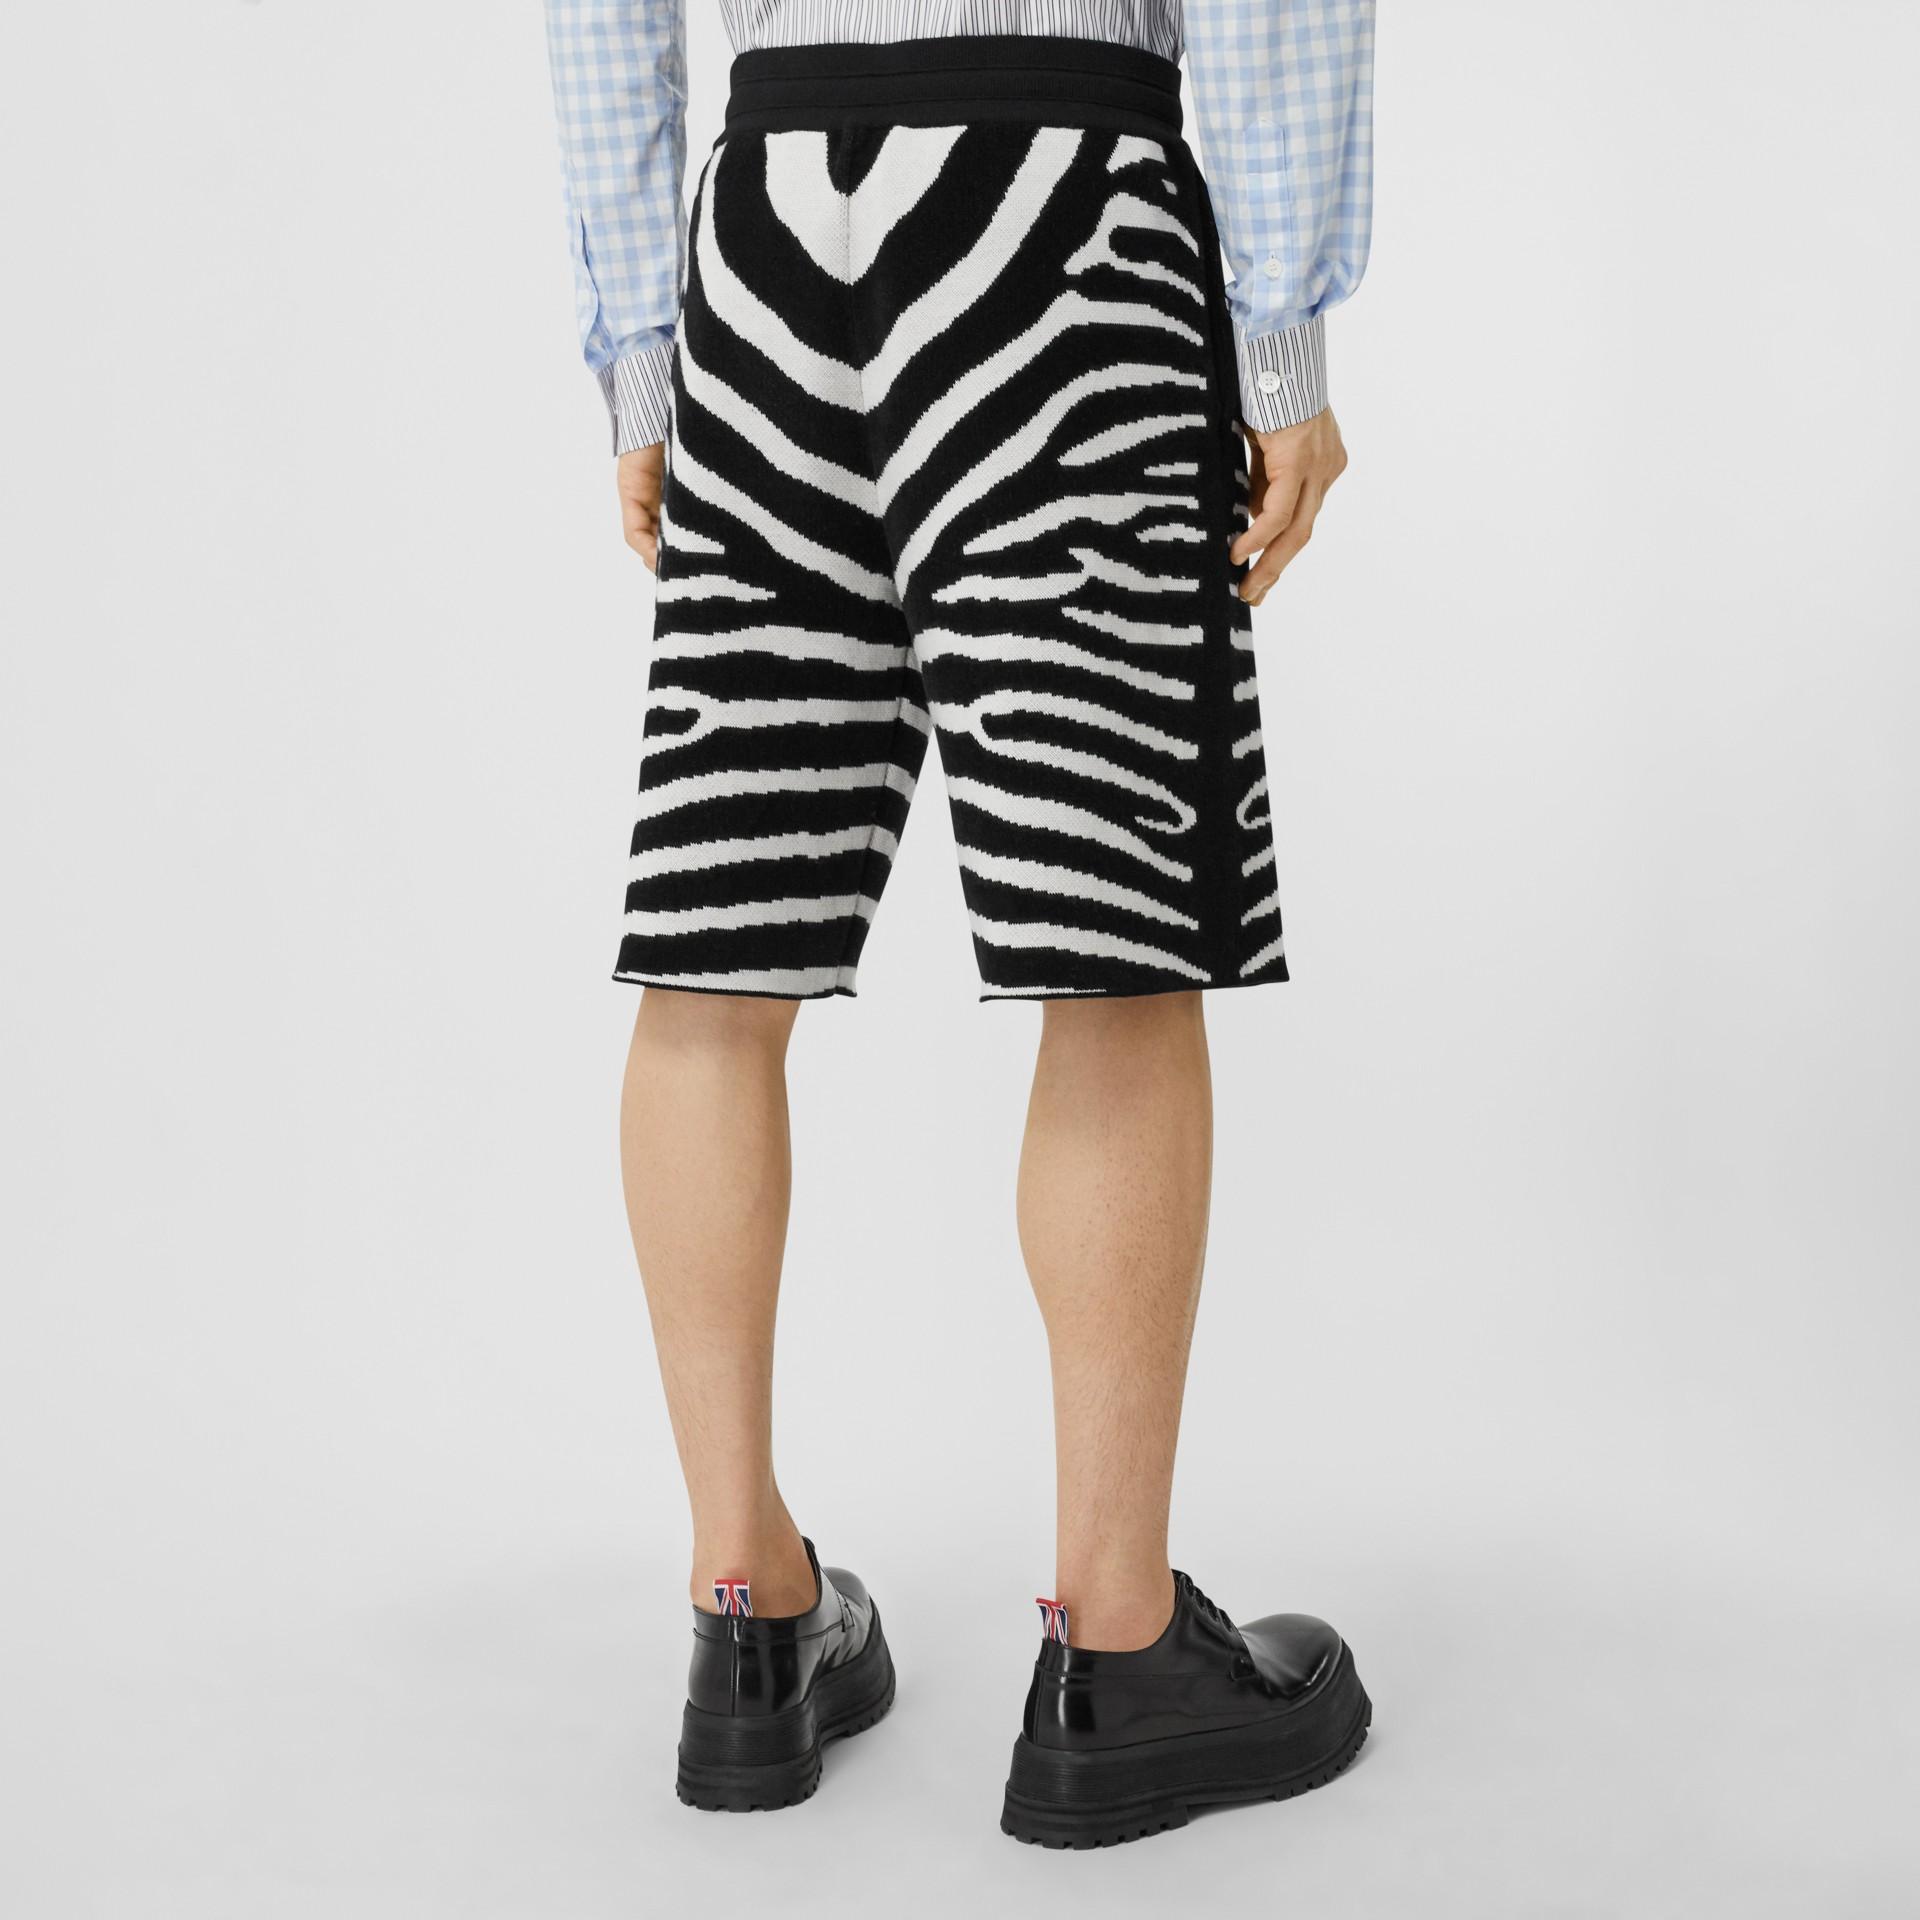 Zebra Wool Blend Jacquard Drawcord Shorts in Black | Burberry United Kingdom - gallery image 2